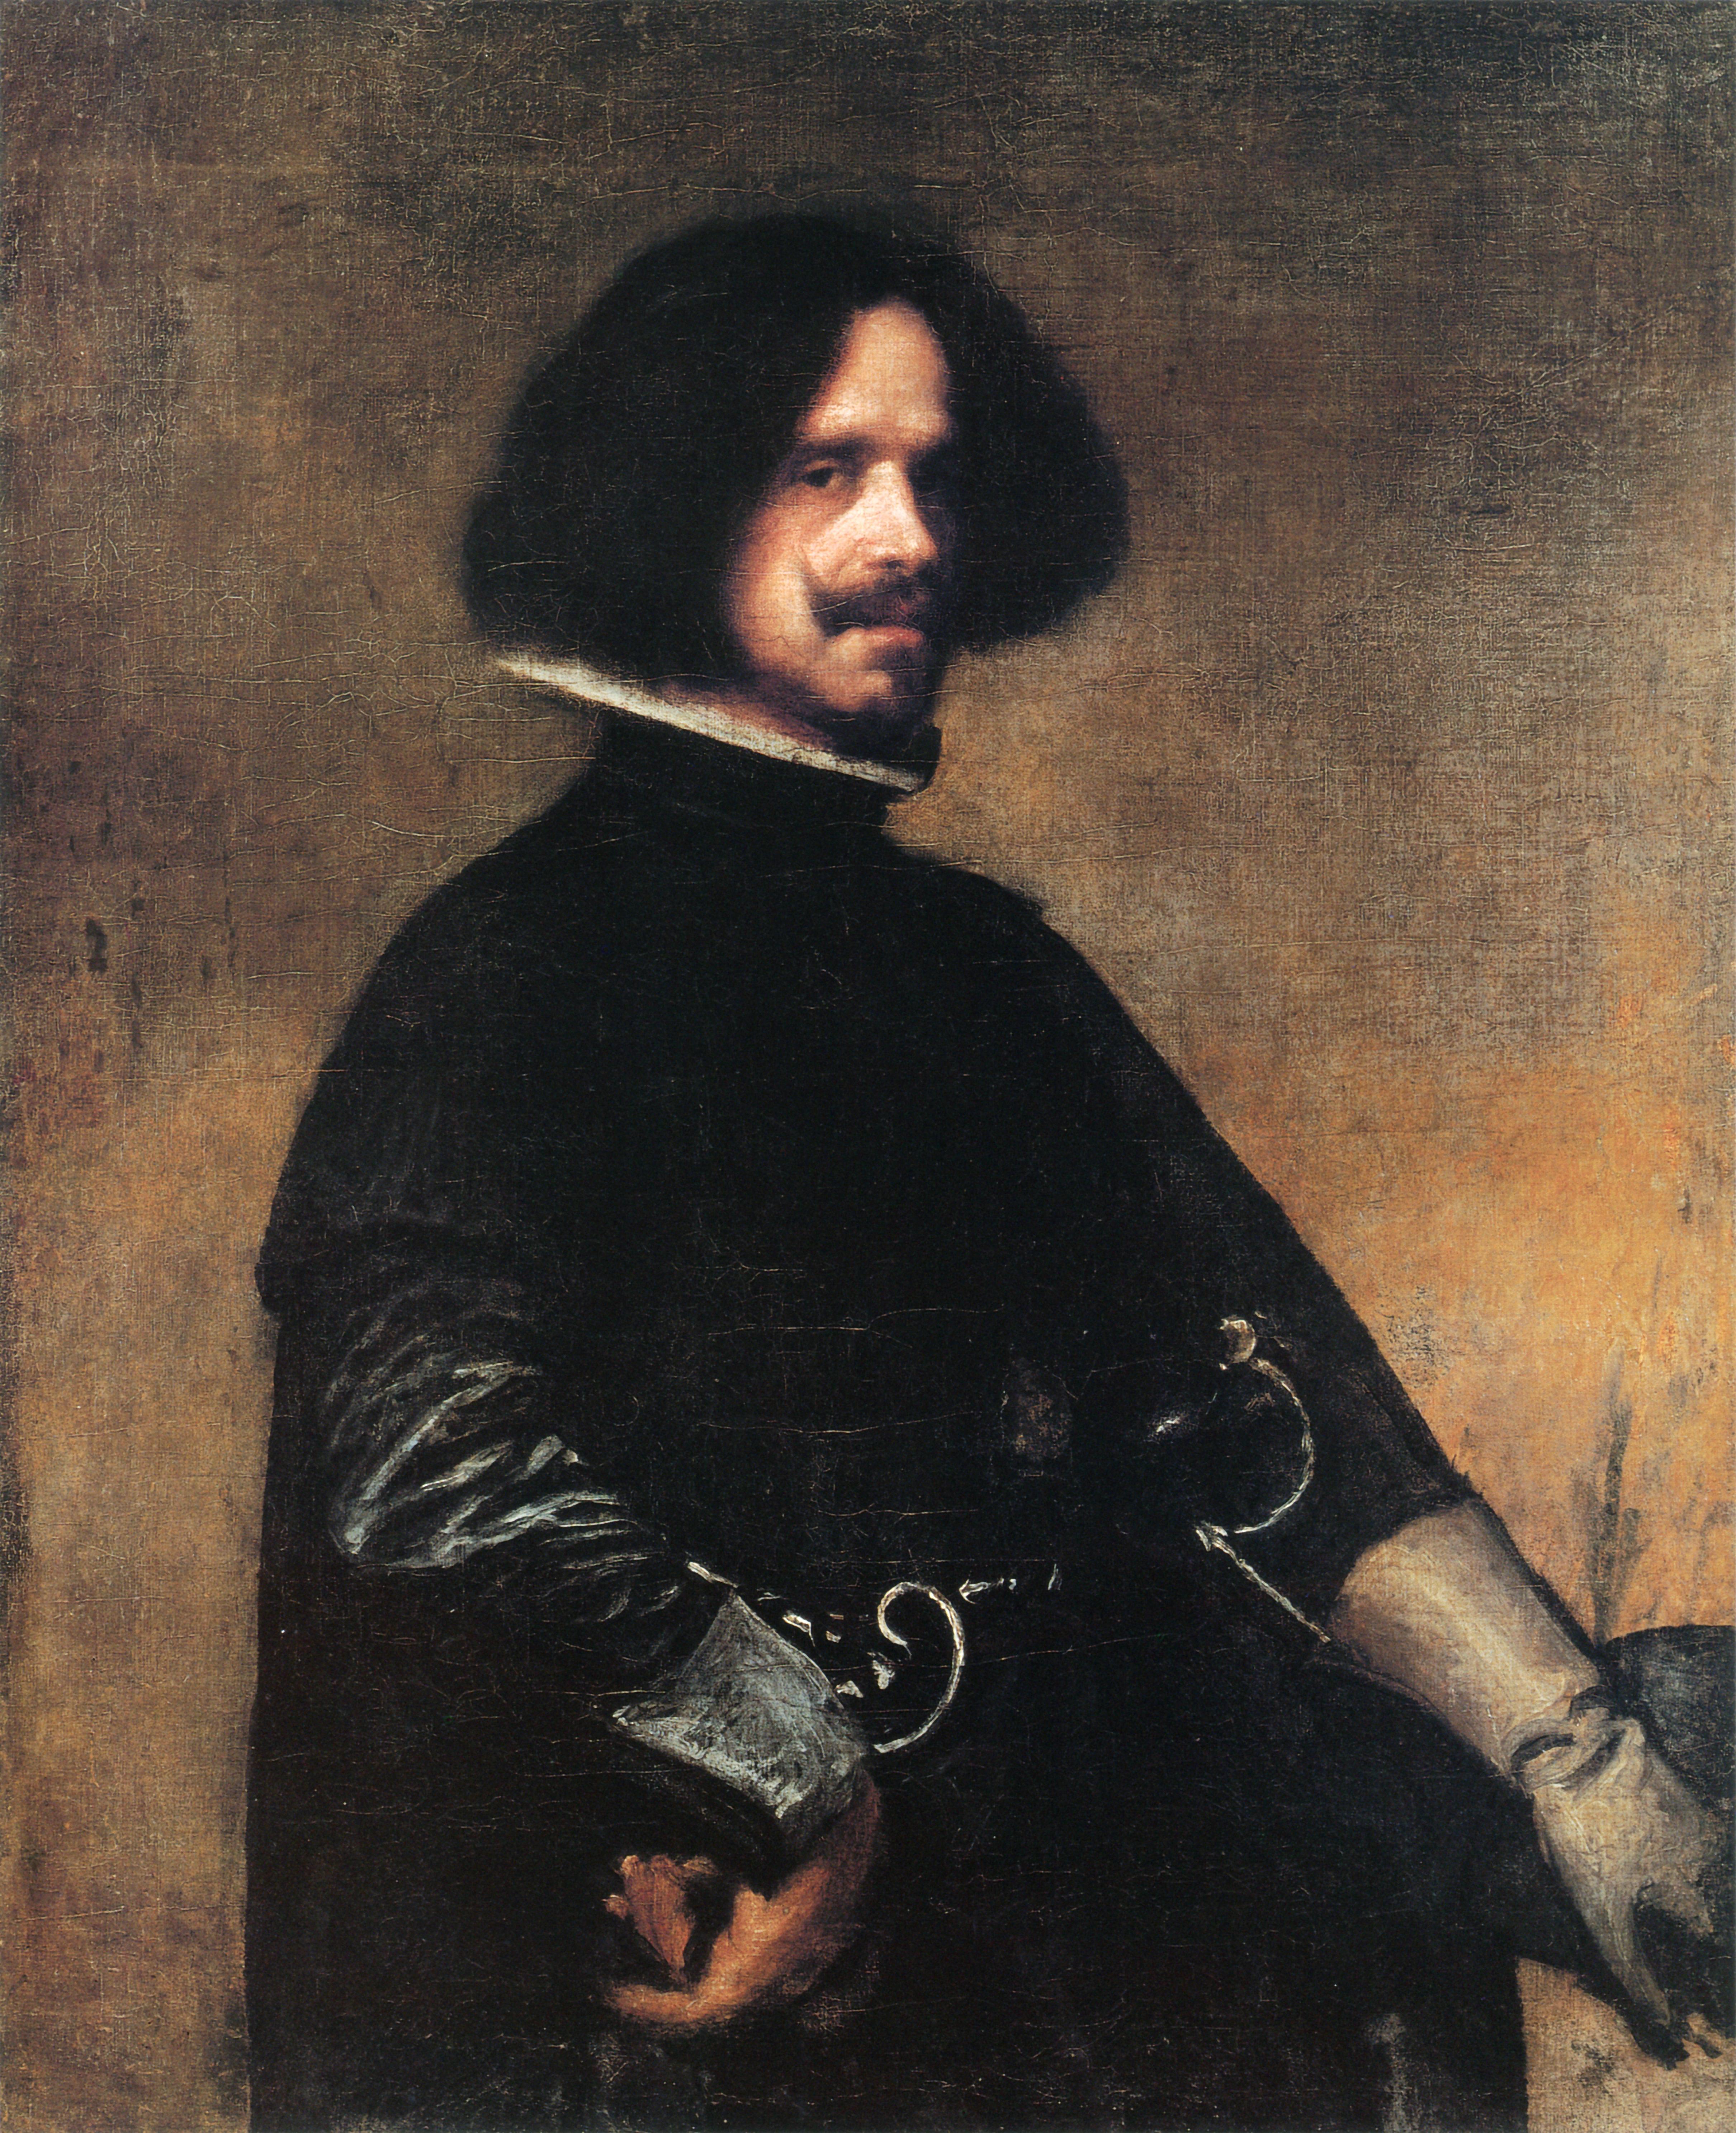 Self-portraitVelazquez